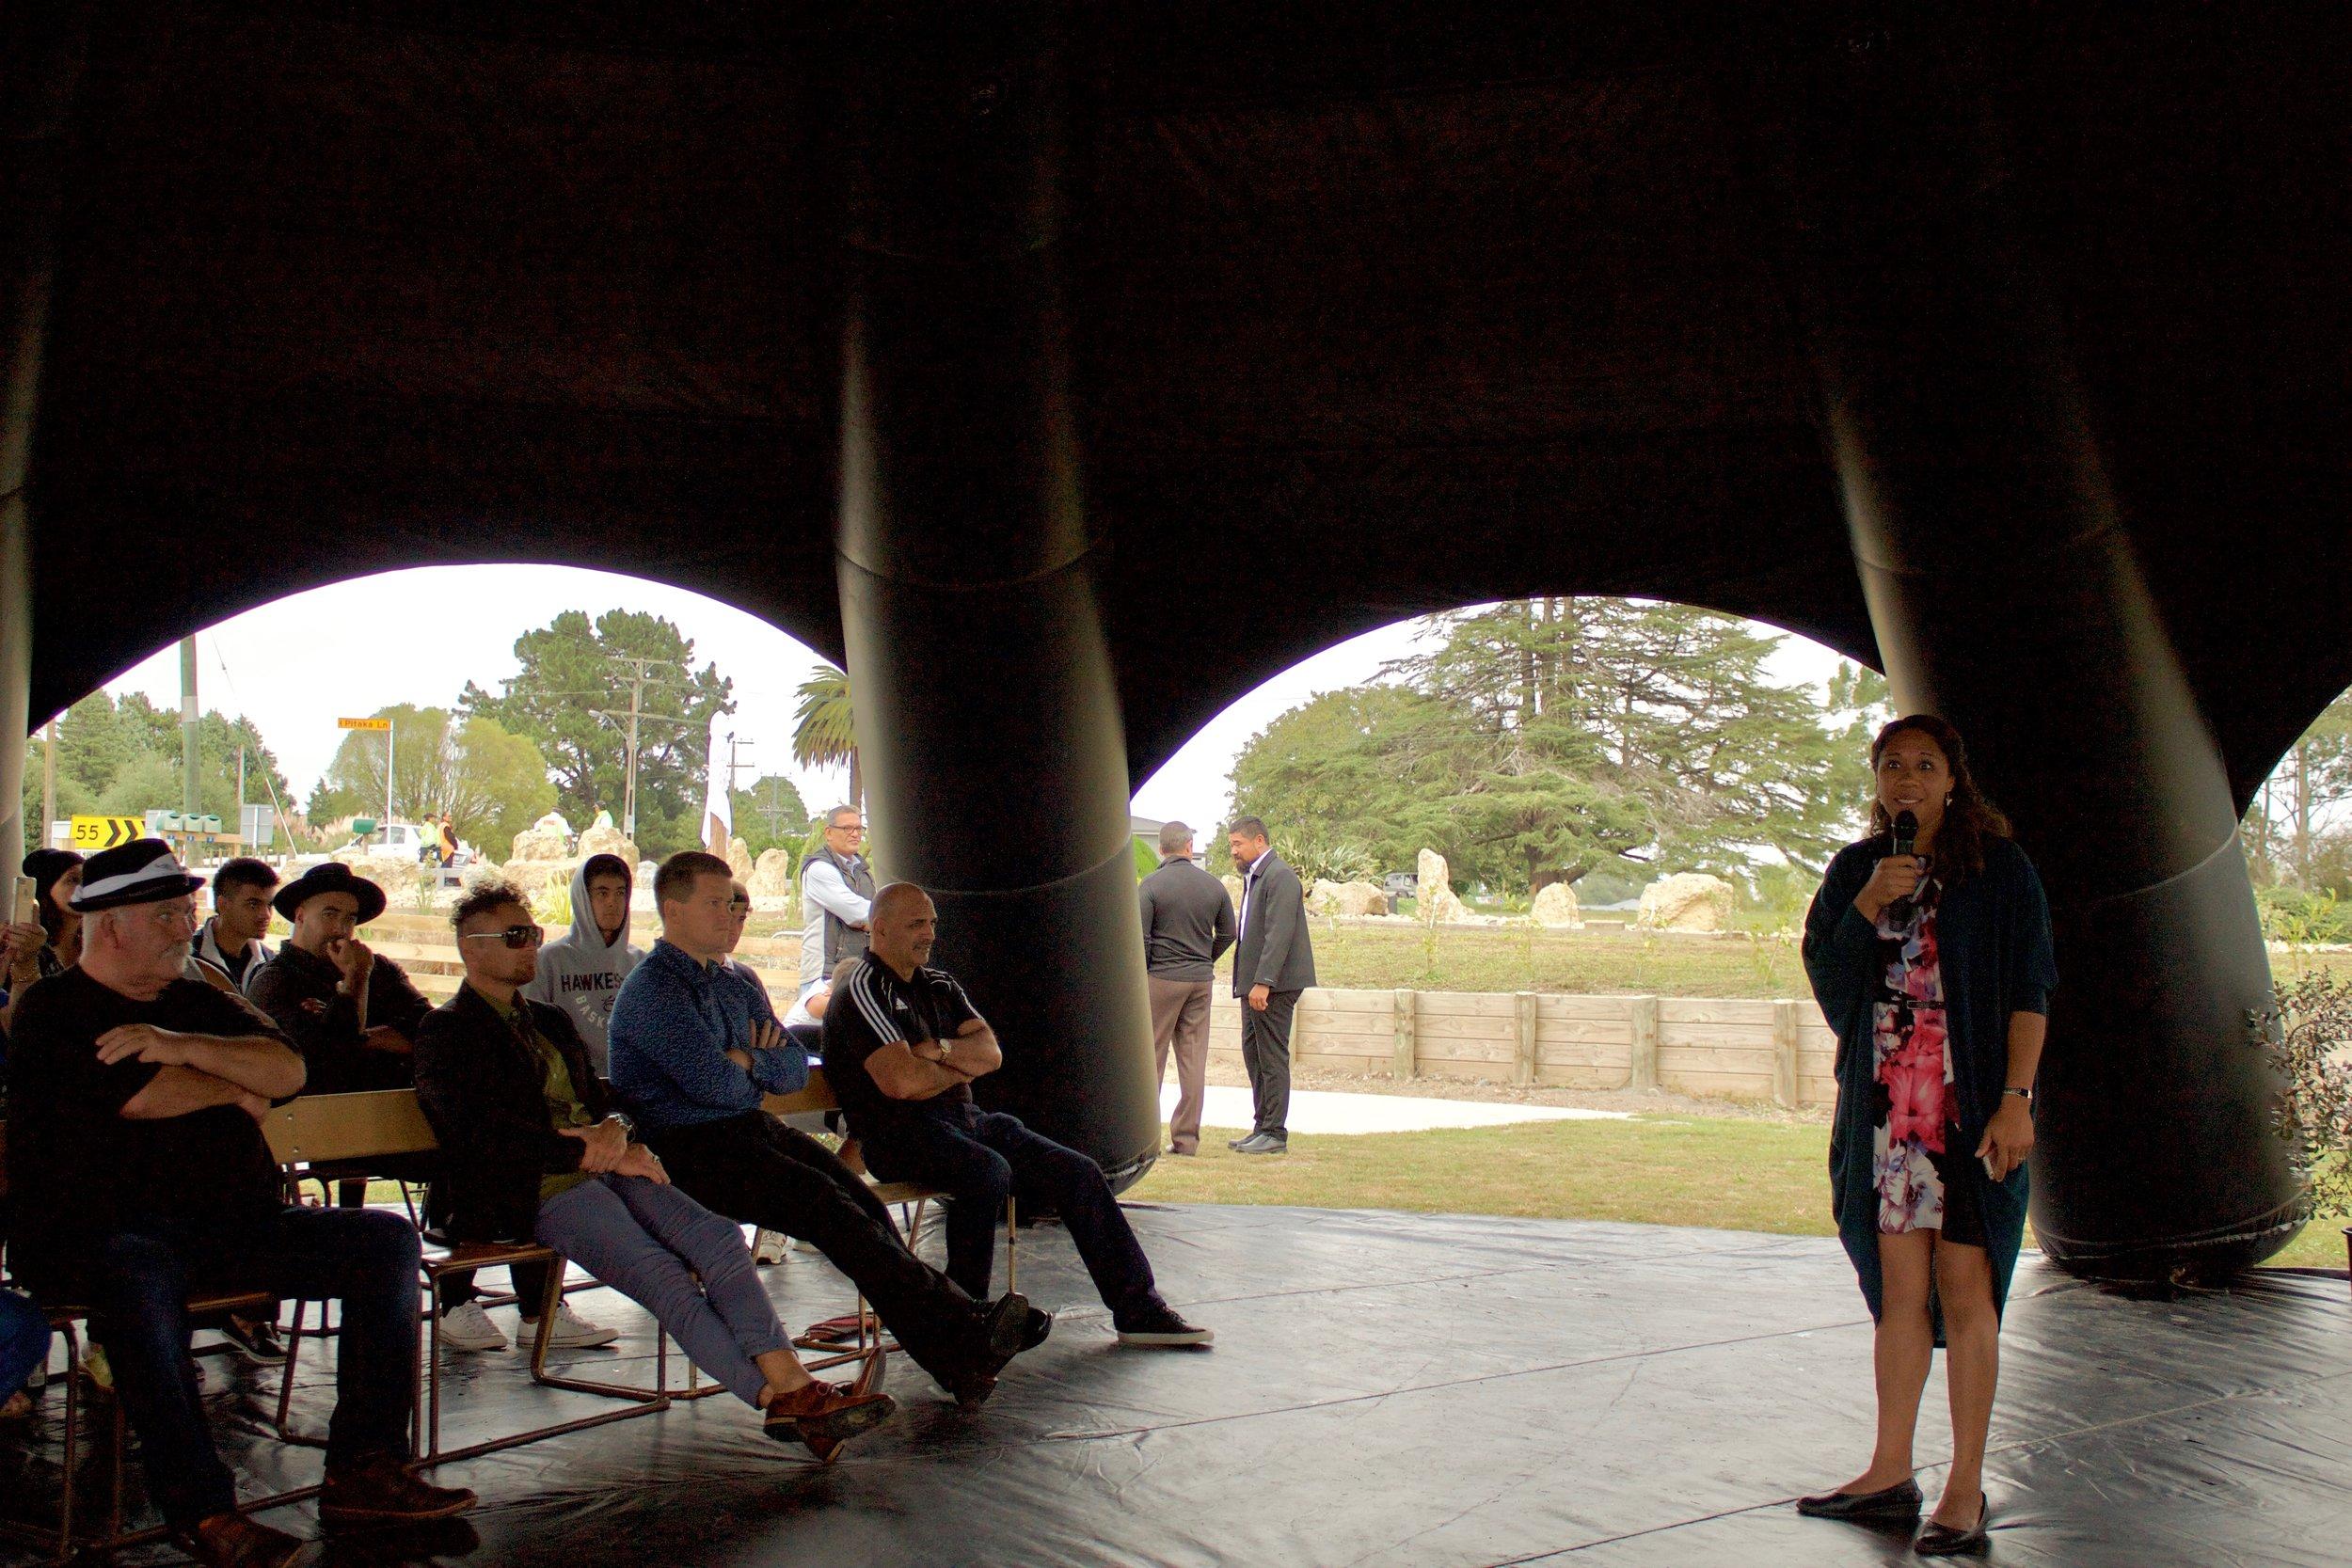 Hinewai Hawaikirangi explains the days programme